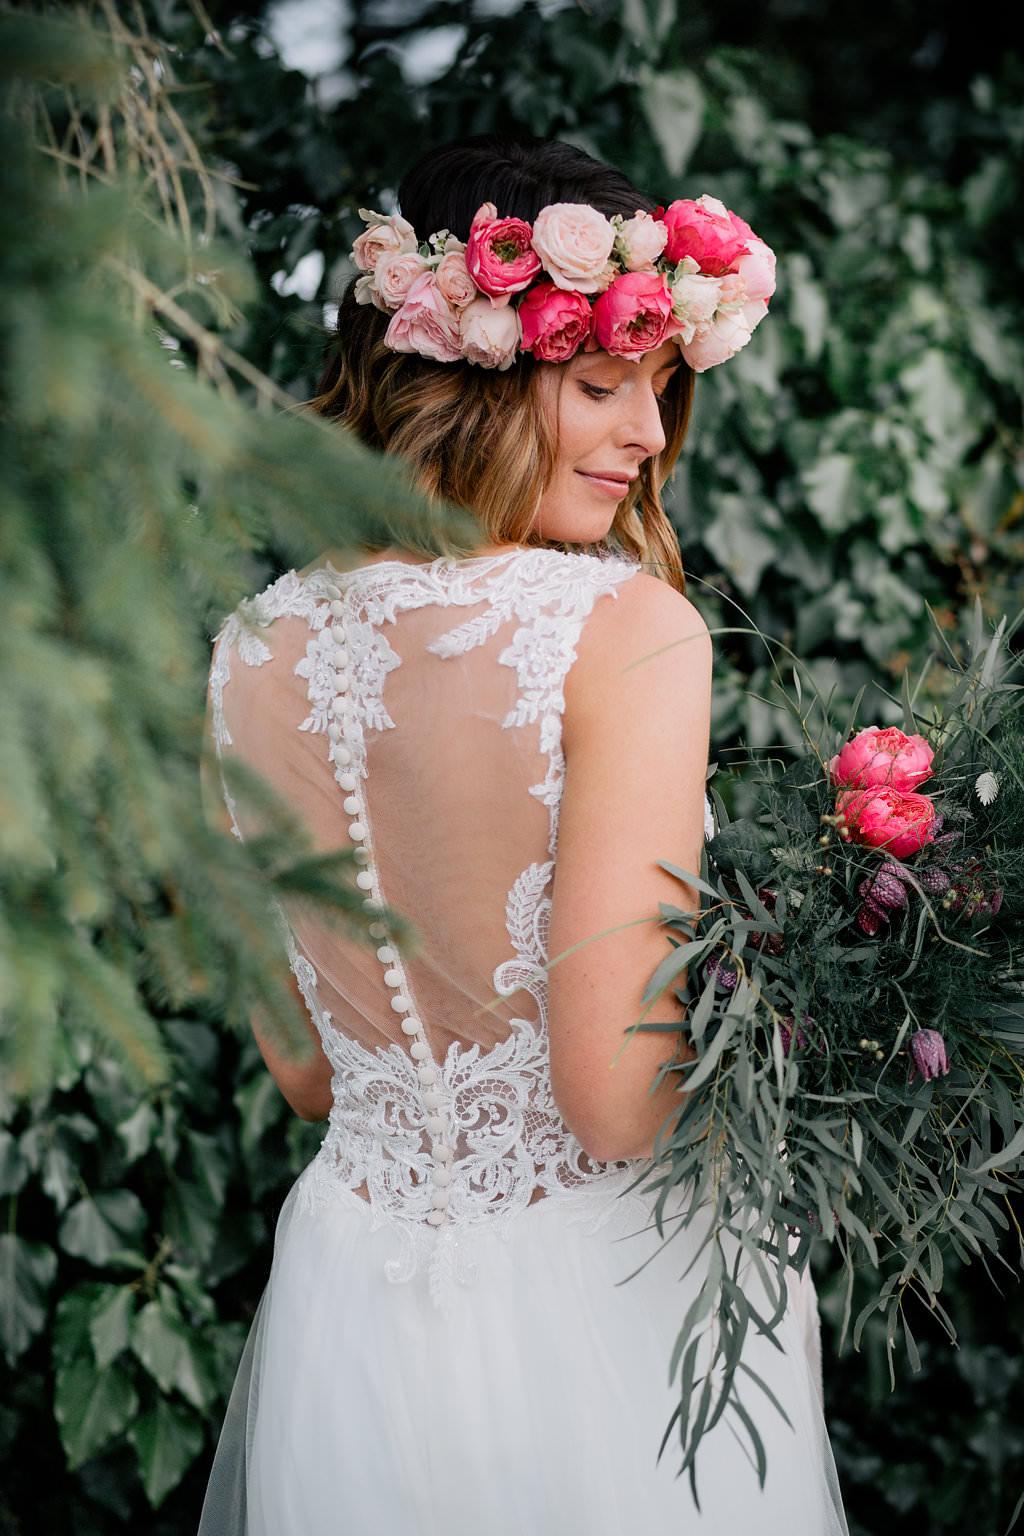 Illusion Lace Dress Gown Bride Bridal Lapstone Barn Wedding Ideas Cotswolds Katie Hamilton Photography